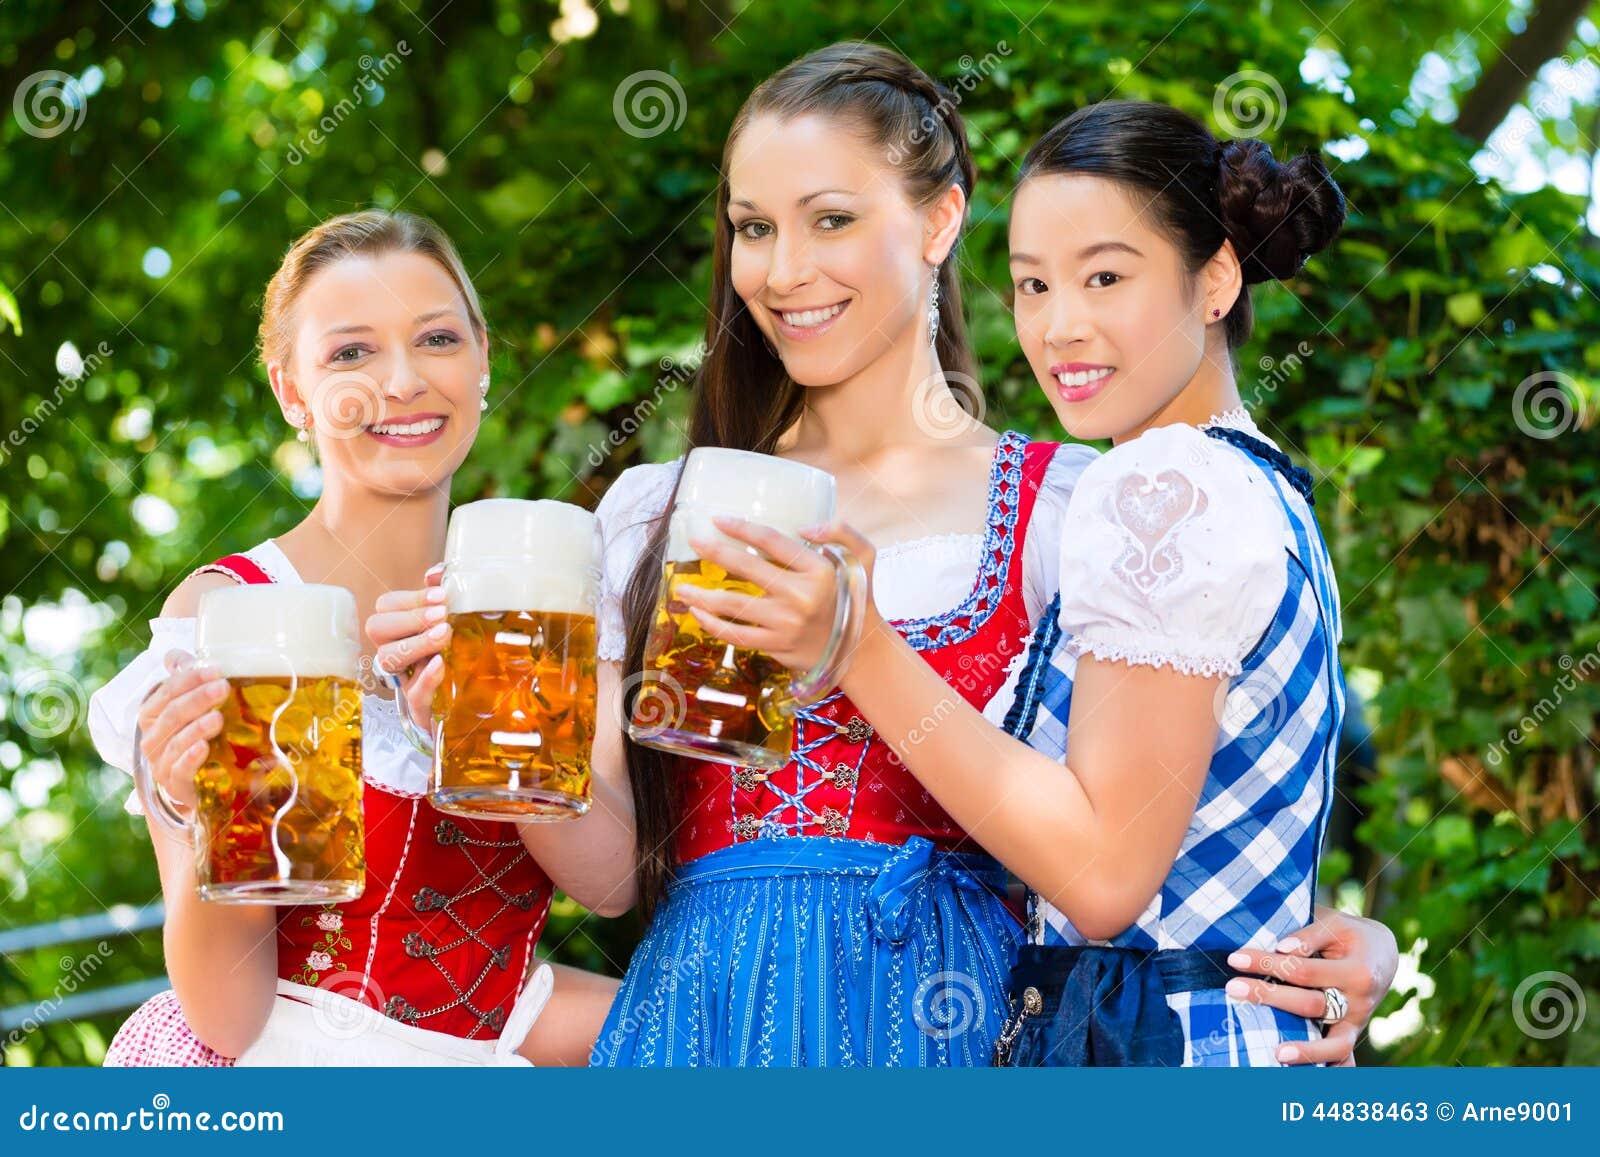 Female friends germany